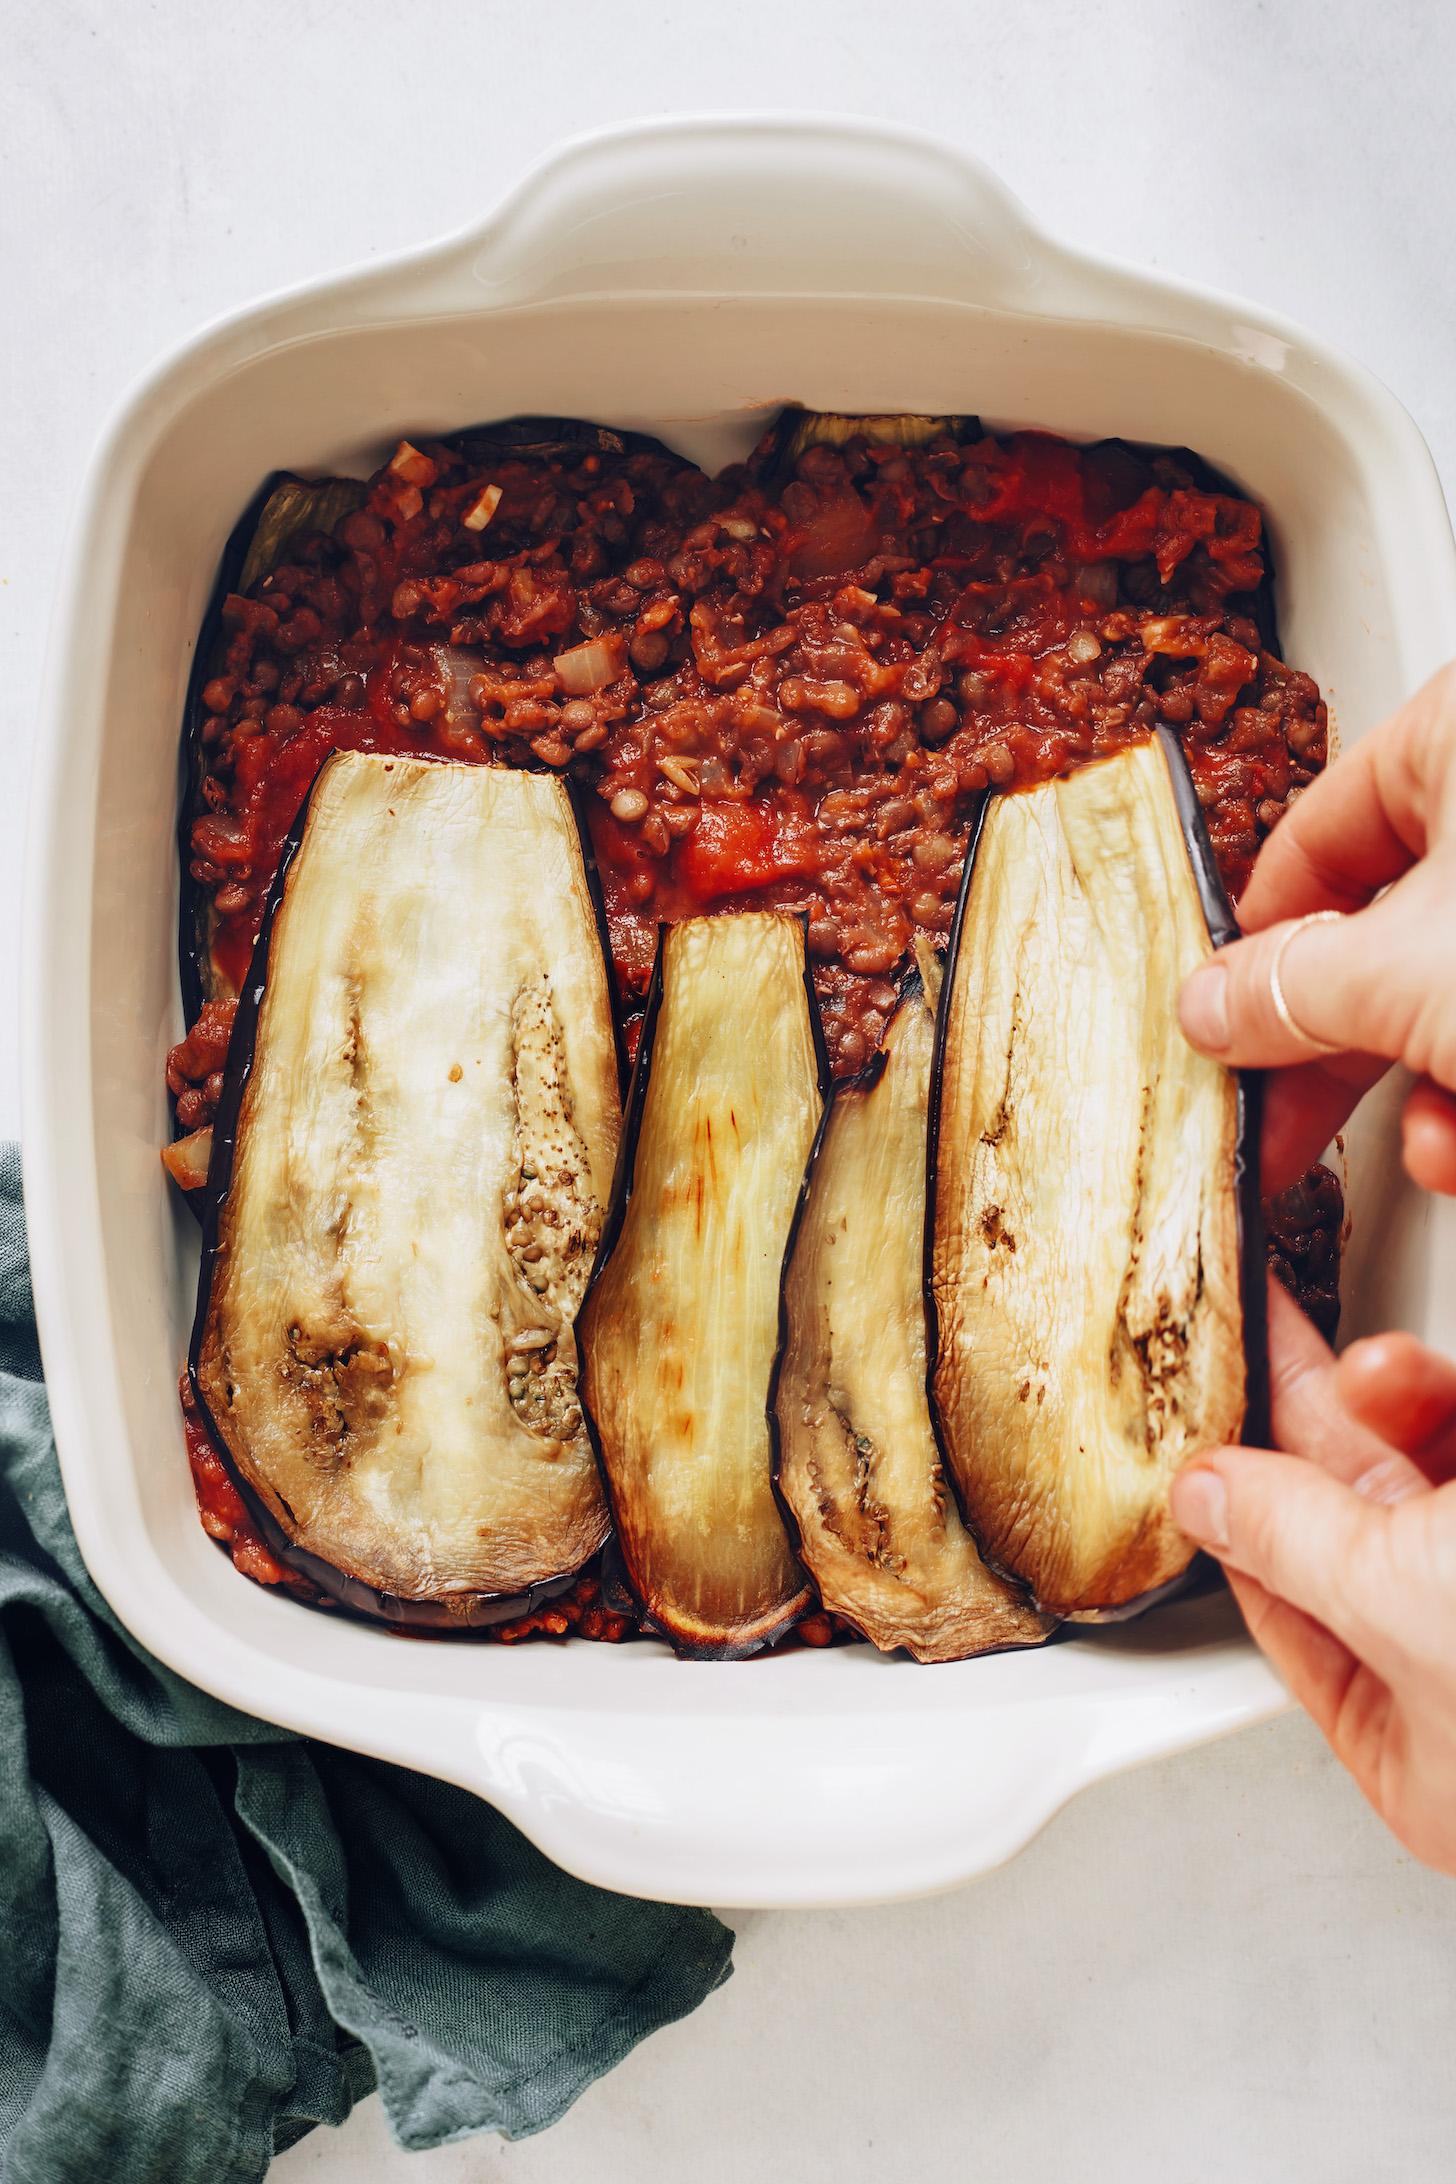 Adding eggplant slices over a lentil tomato filling